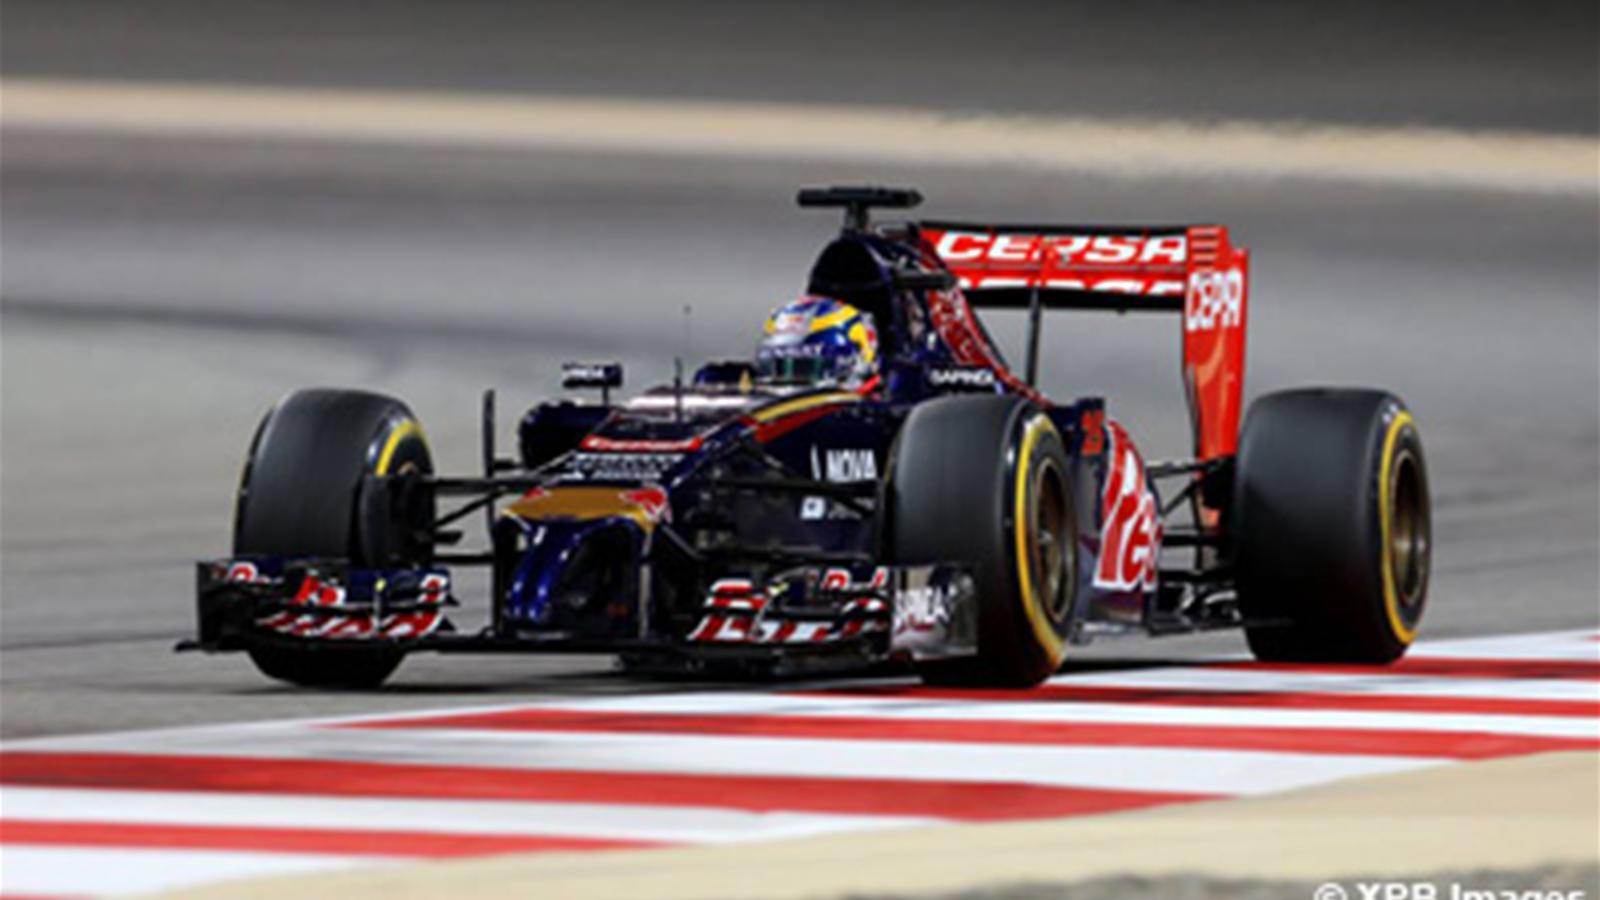 Vergne c est un grand malade grand prix de bahre n 2014 formule 1 eurosport - Formule vitesse de coupe ...